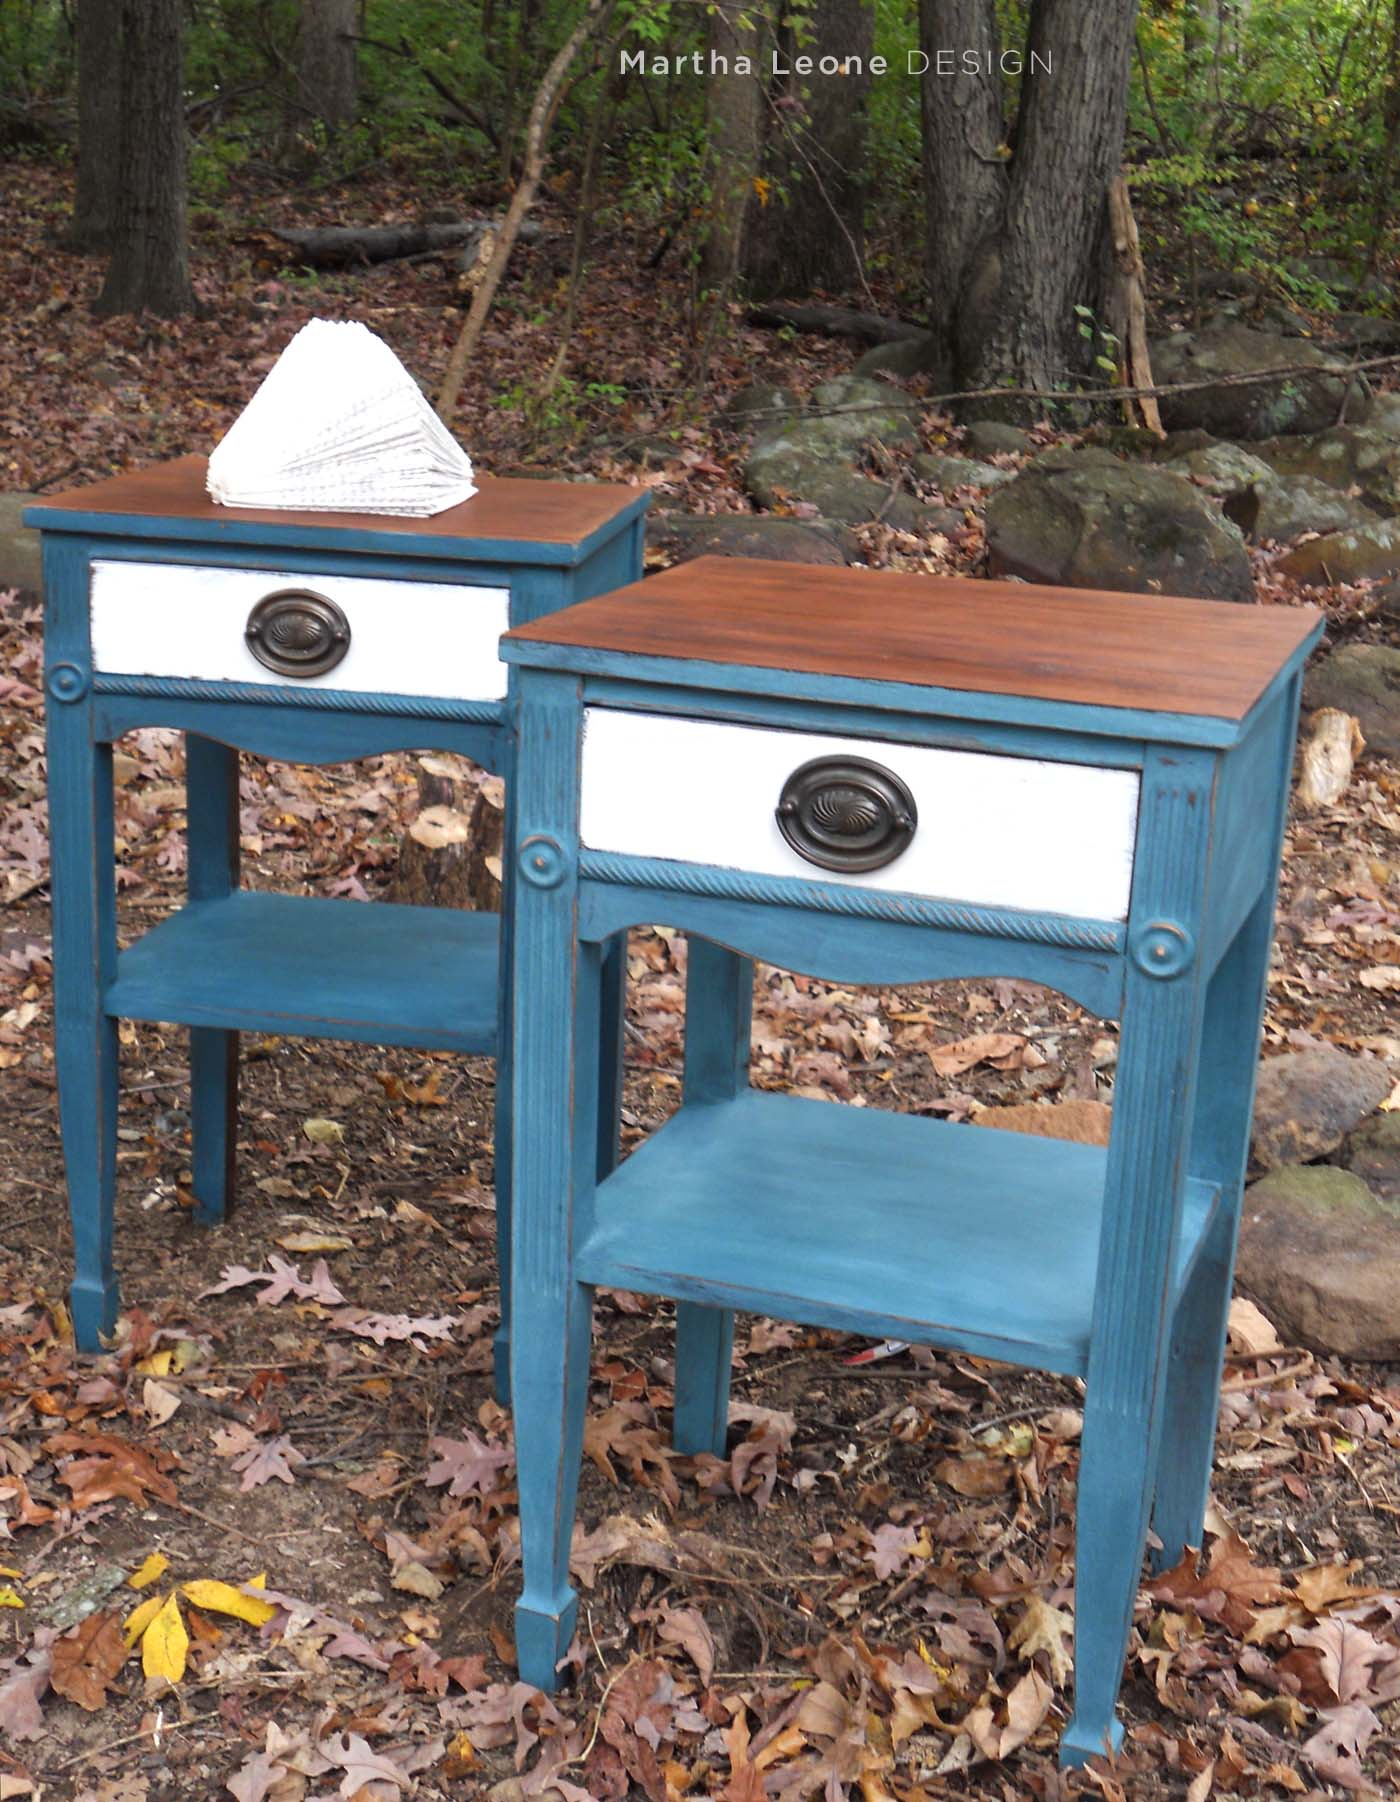 Blue with hepplewhite 5 at MarthaLeoneDesign